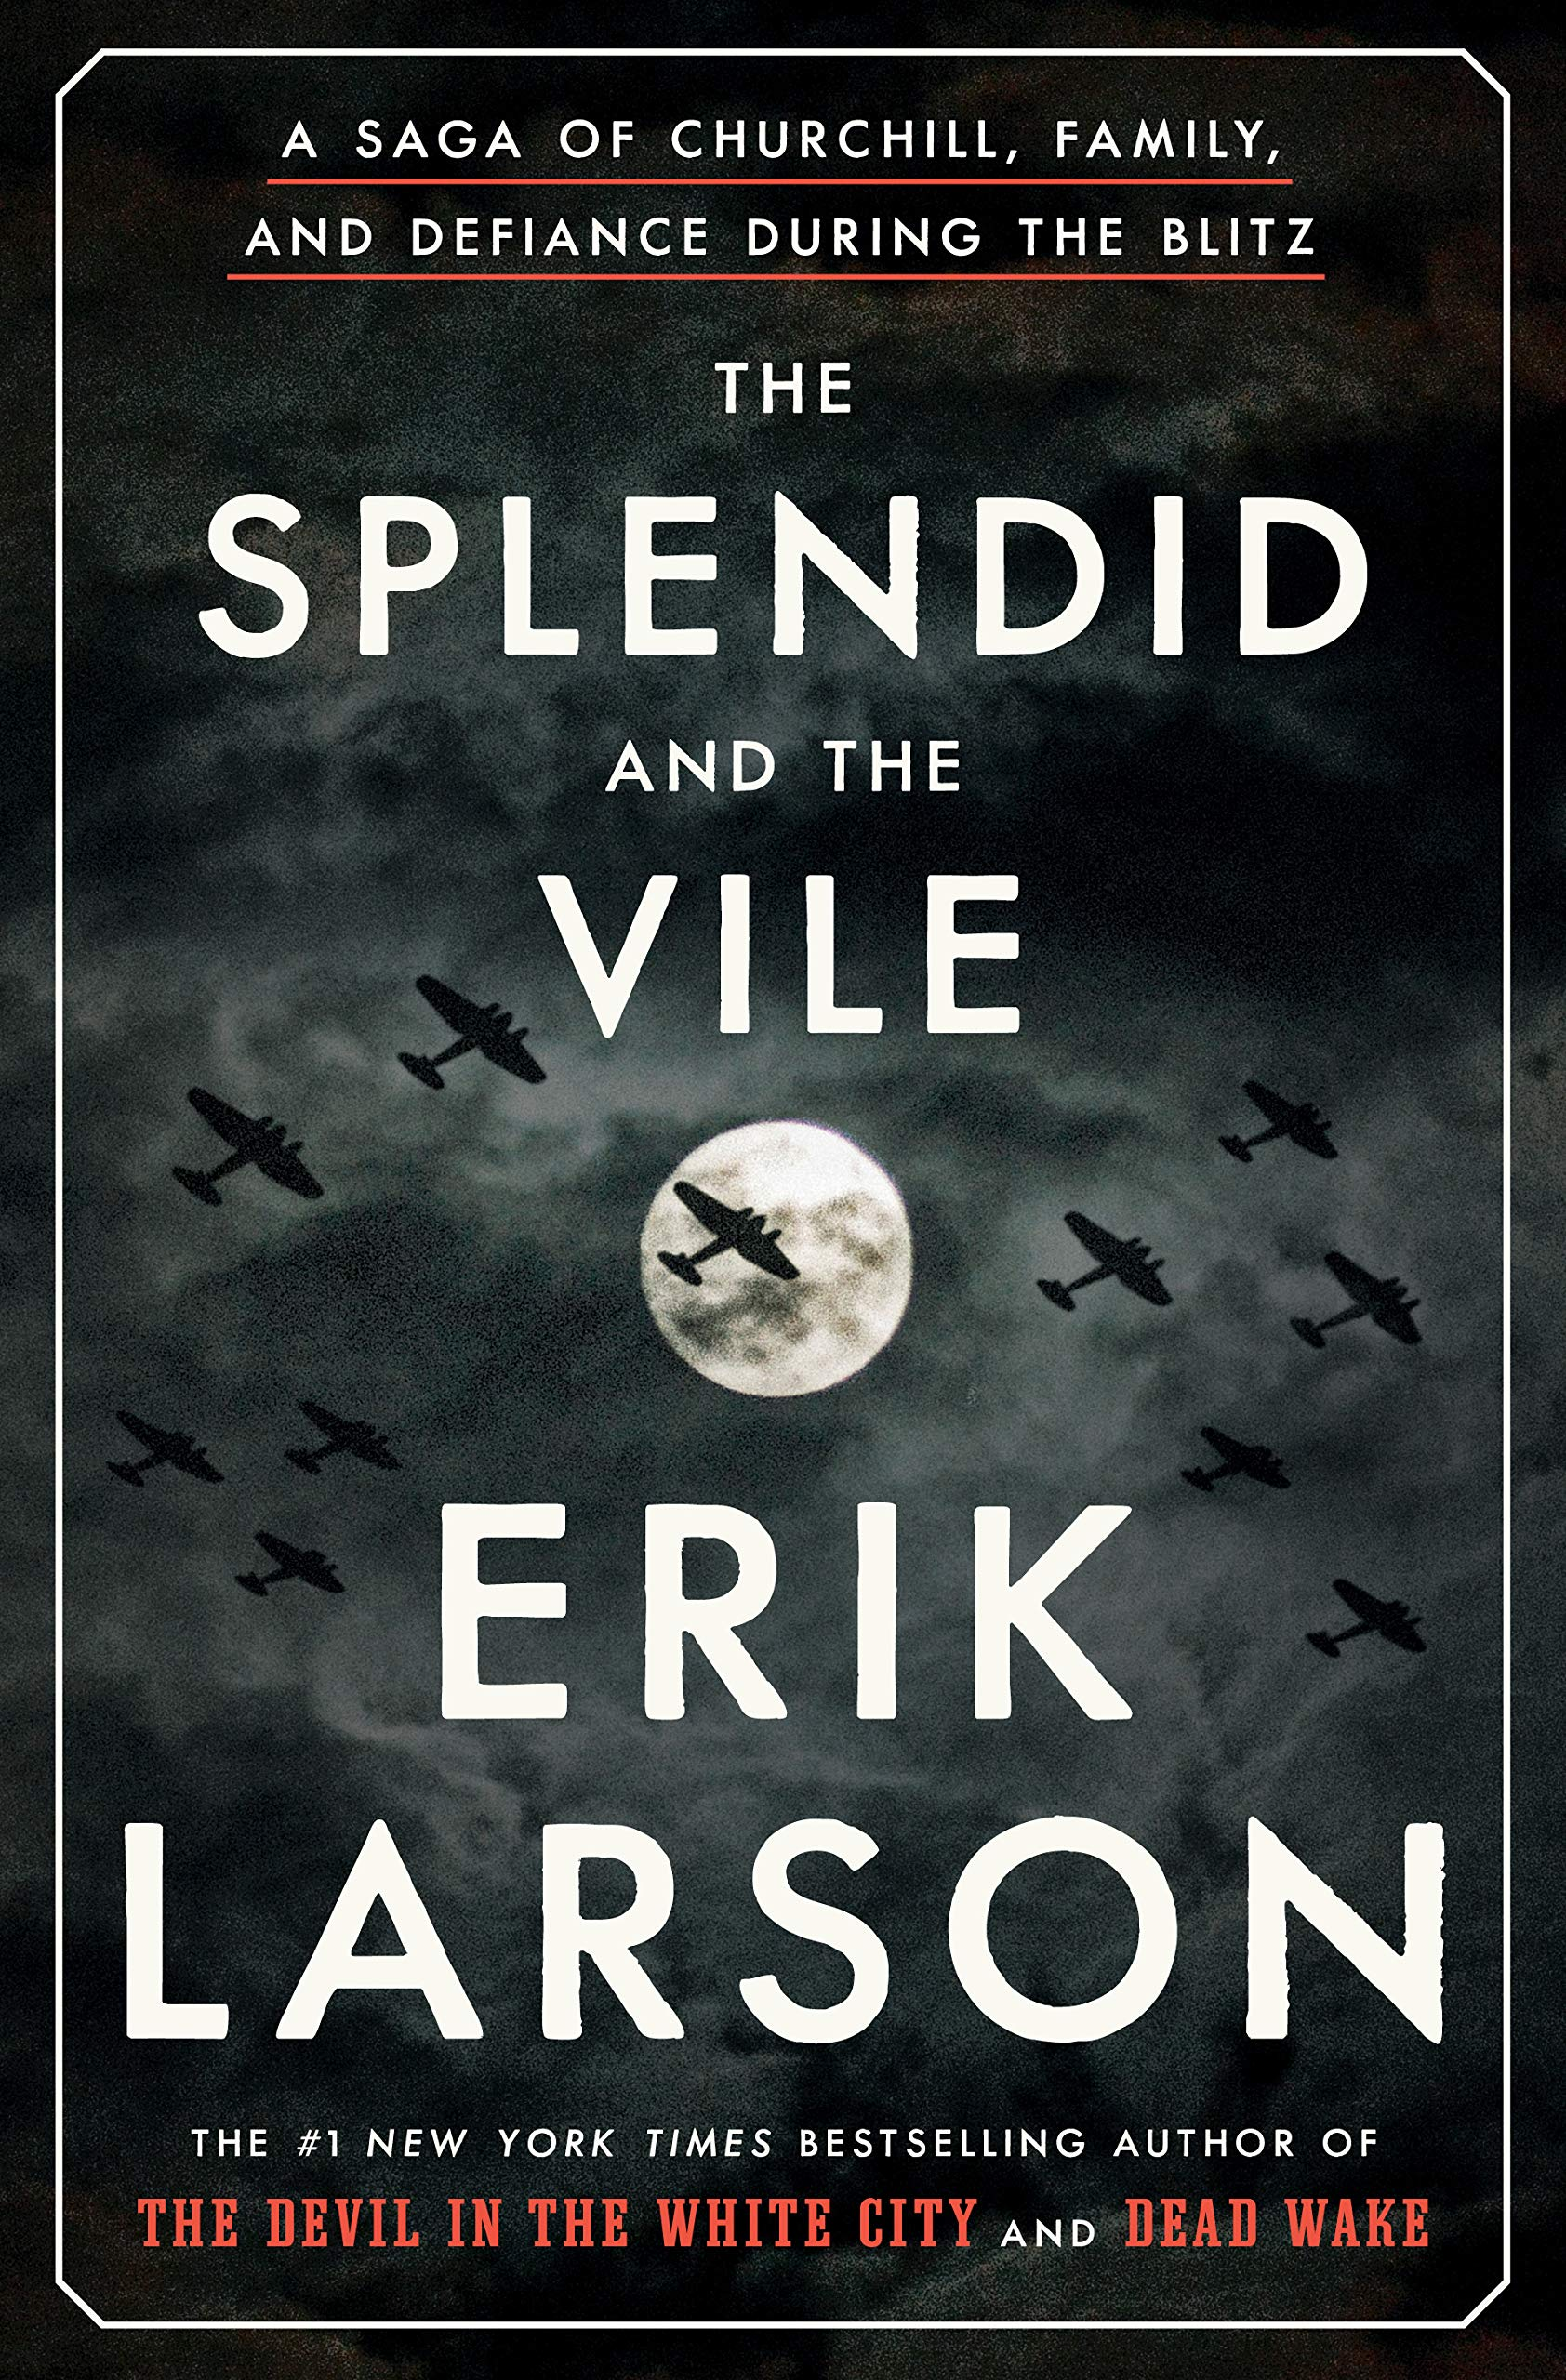 Erik Larson, The Splendid and the Vile